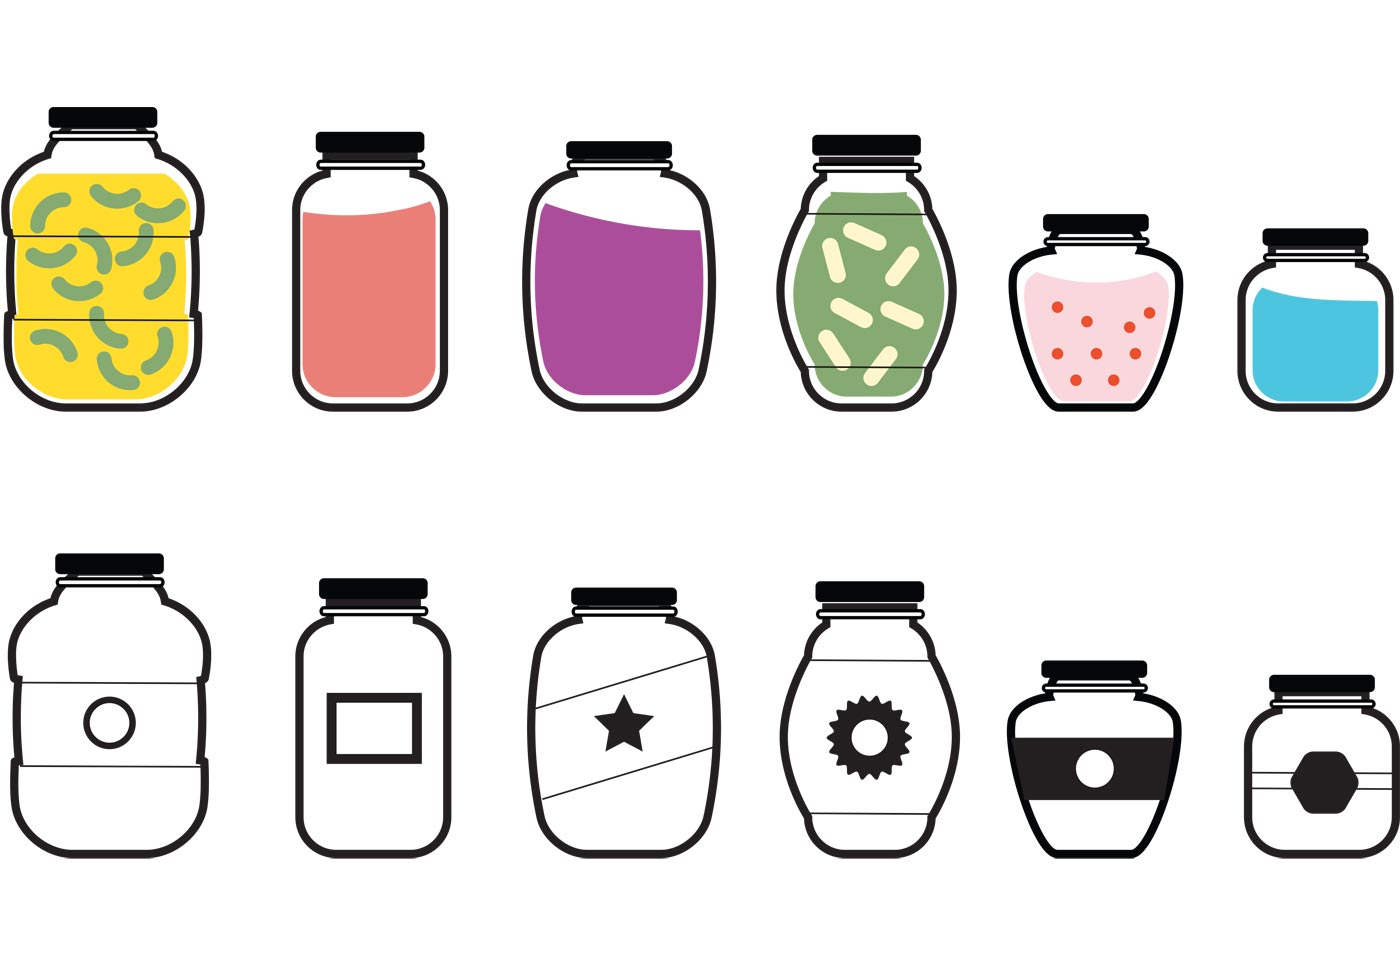 Mason Jar Vector Icons - Download Free Vector Art, Stock ...